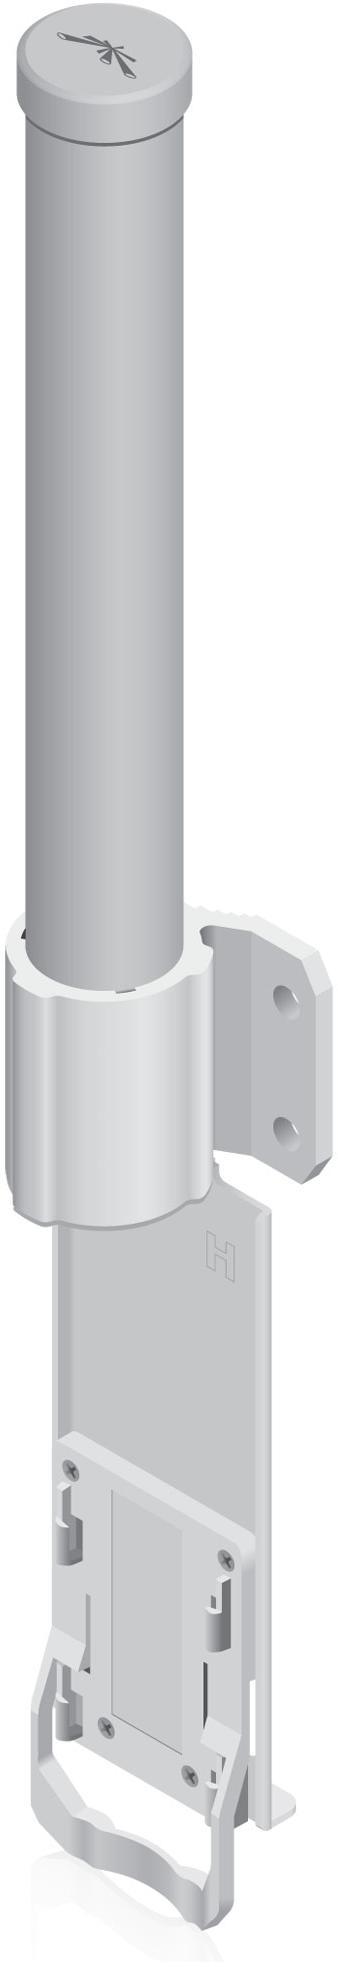 Ubiquiti AirMax Omni AMO-5G10